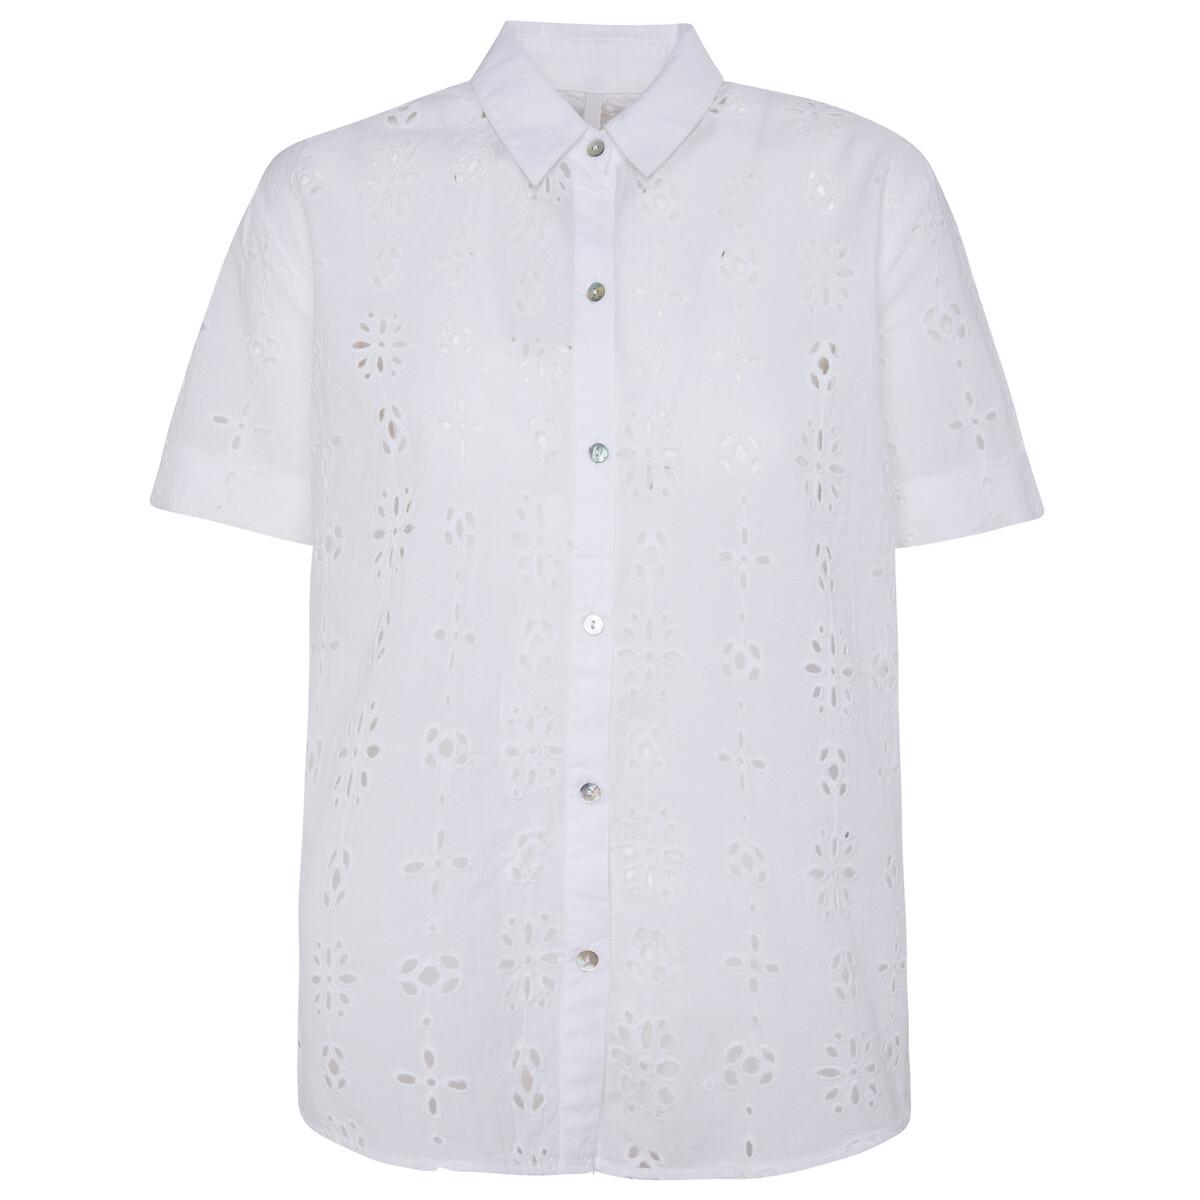 Camisa de manga corta con bordado inglés